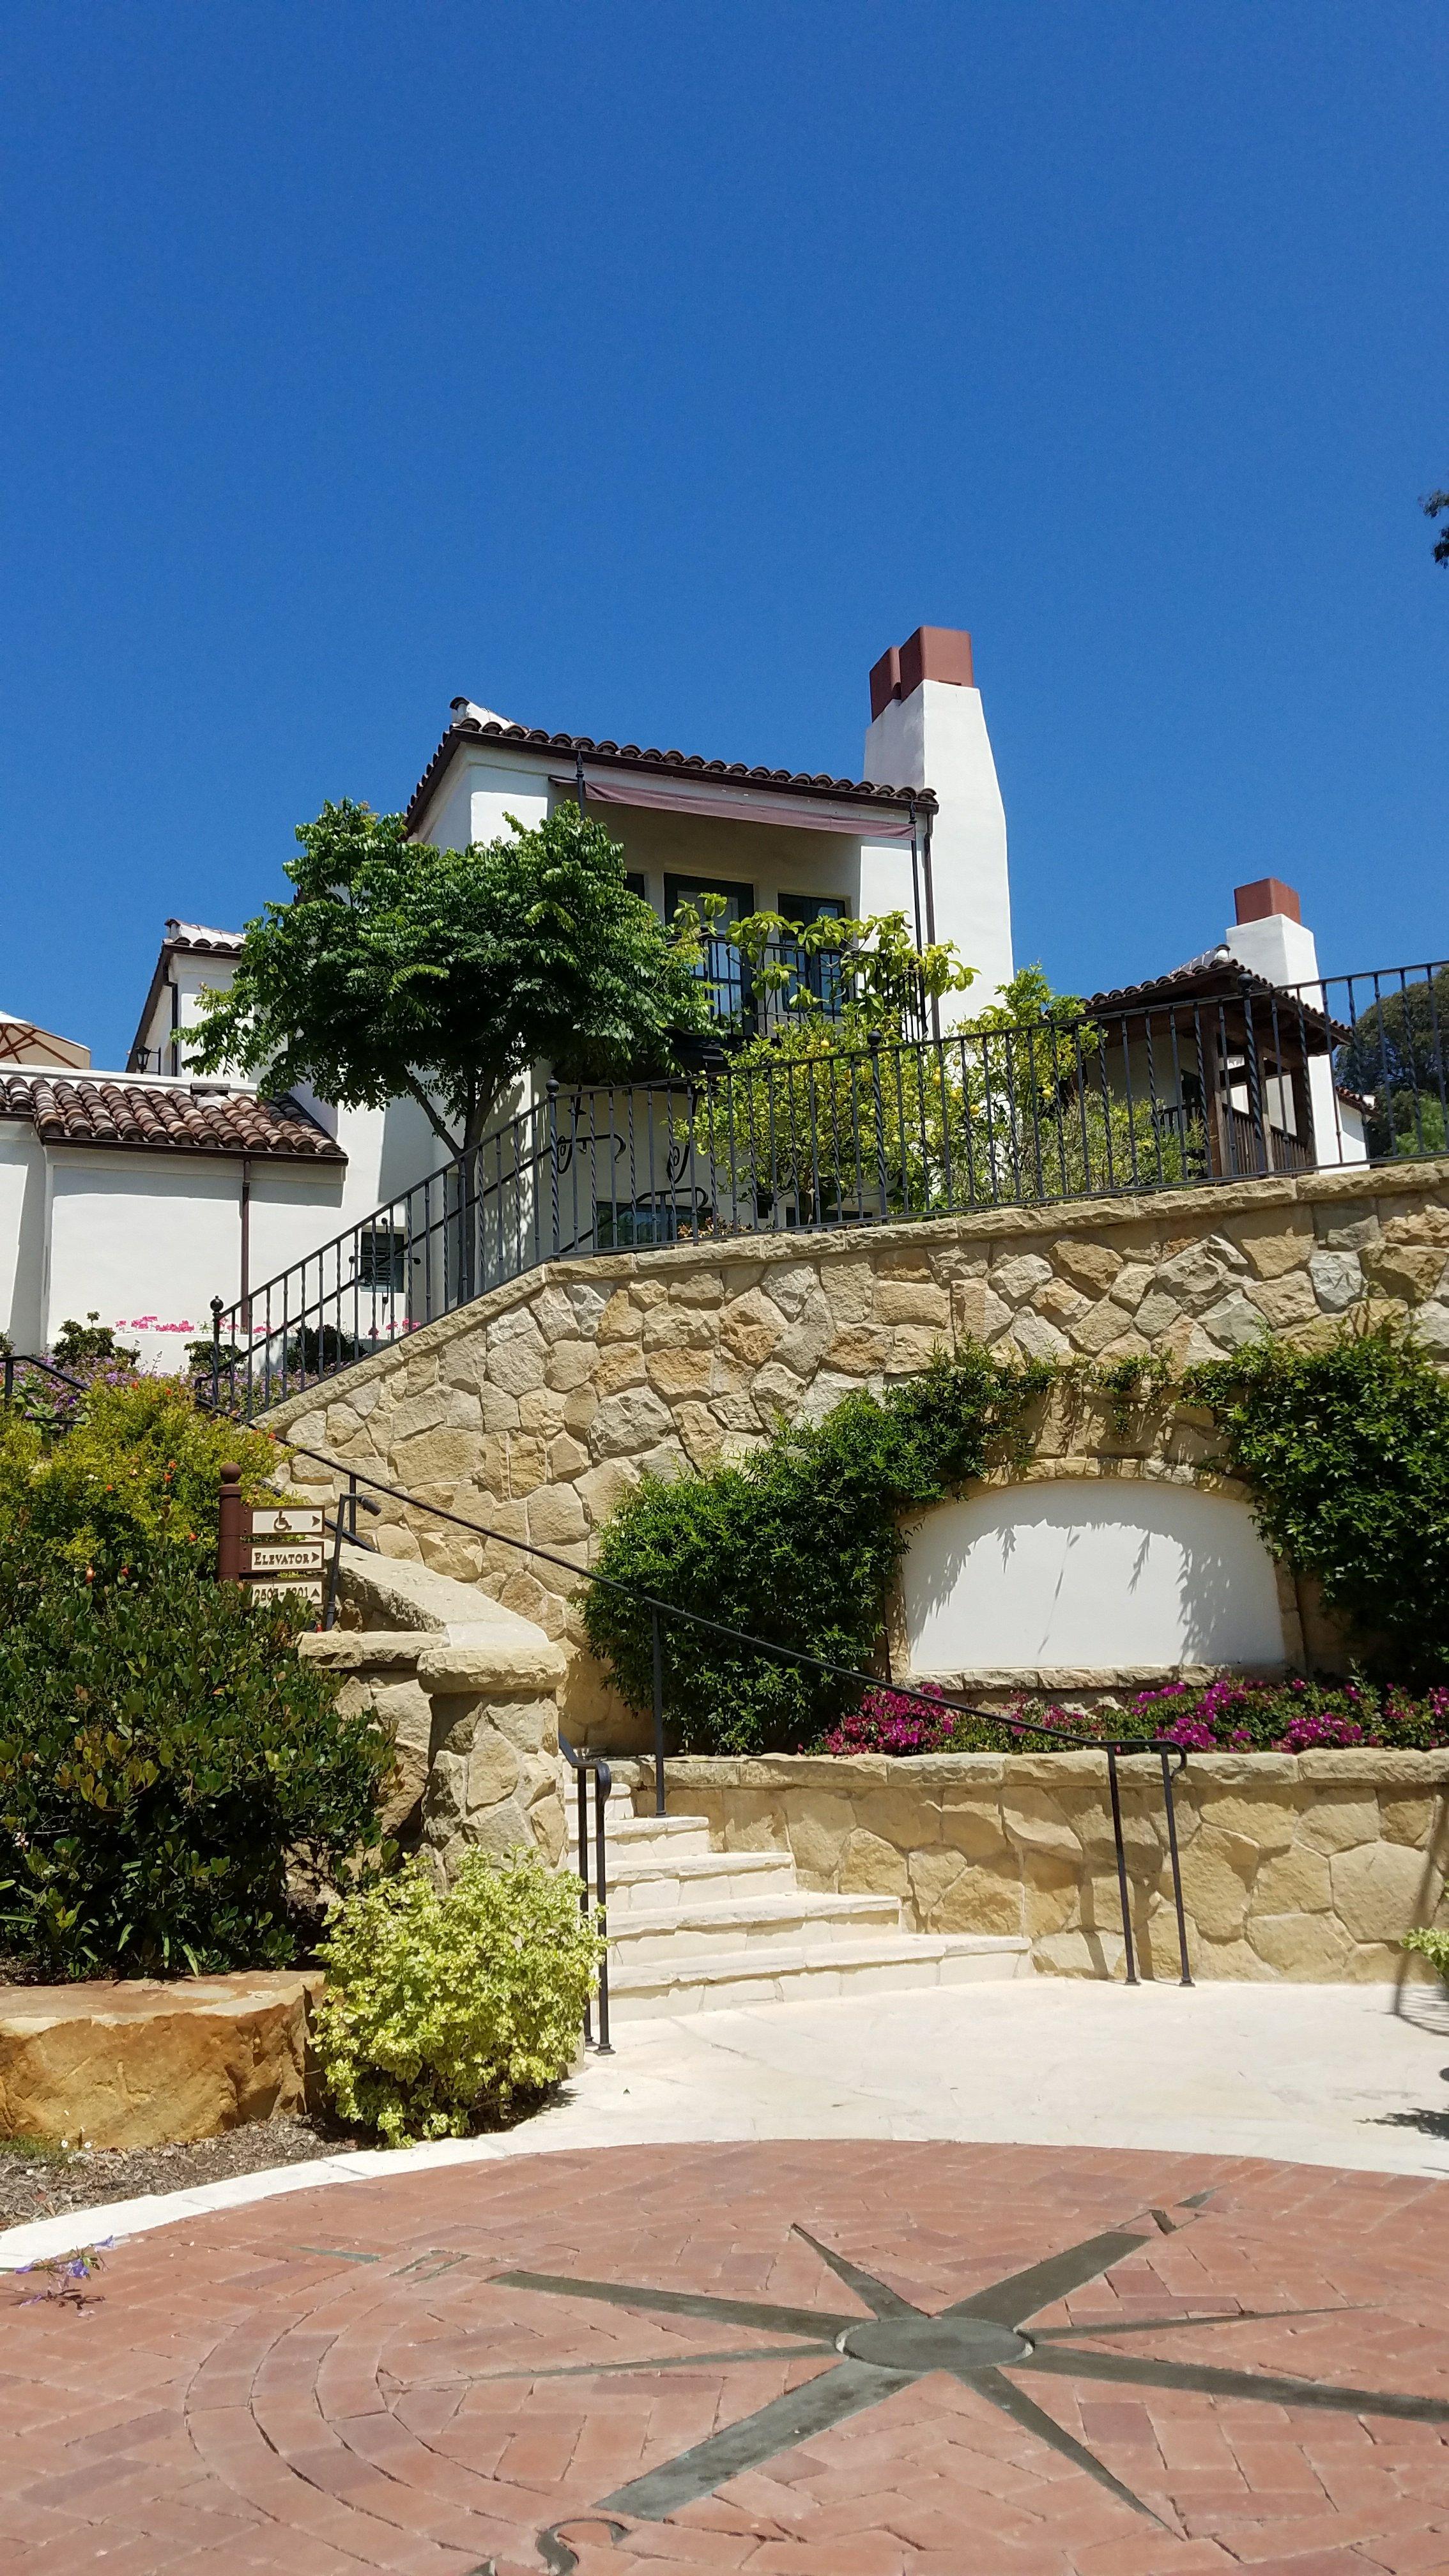 Belmond El Encanto bungalows